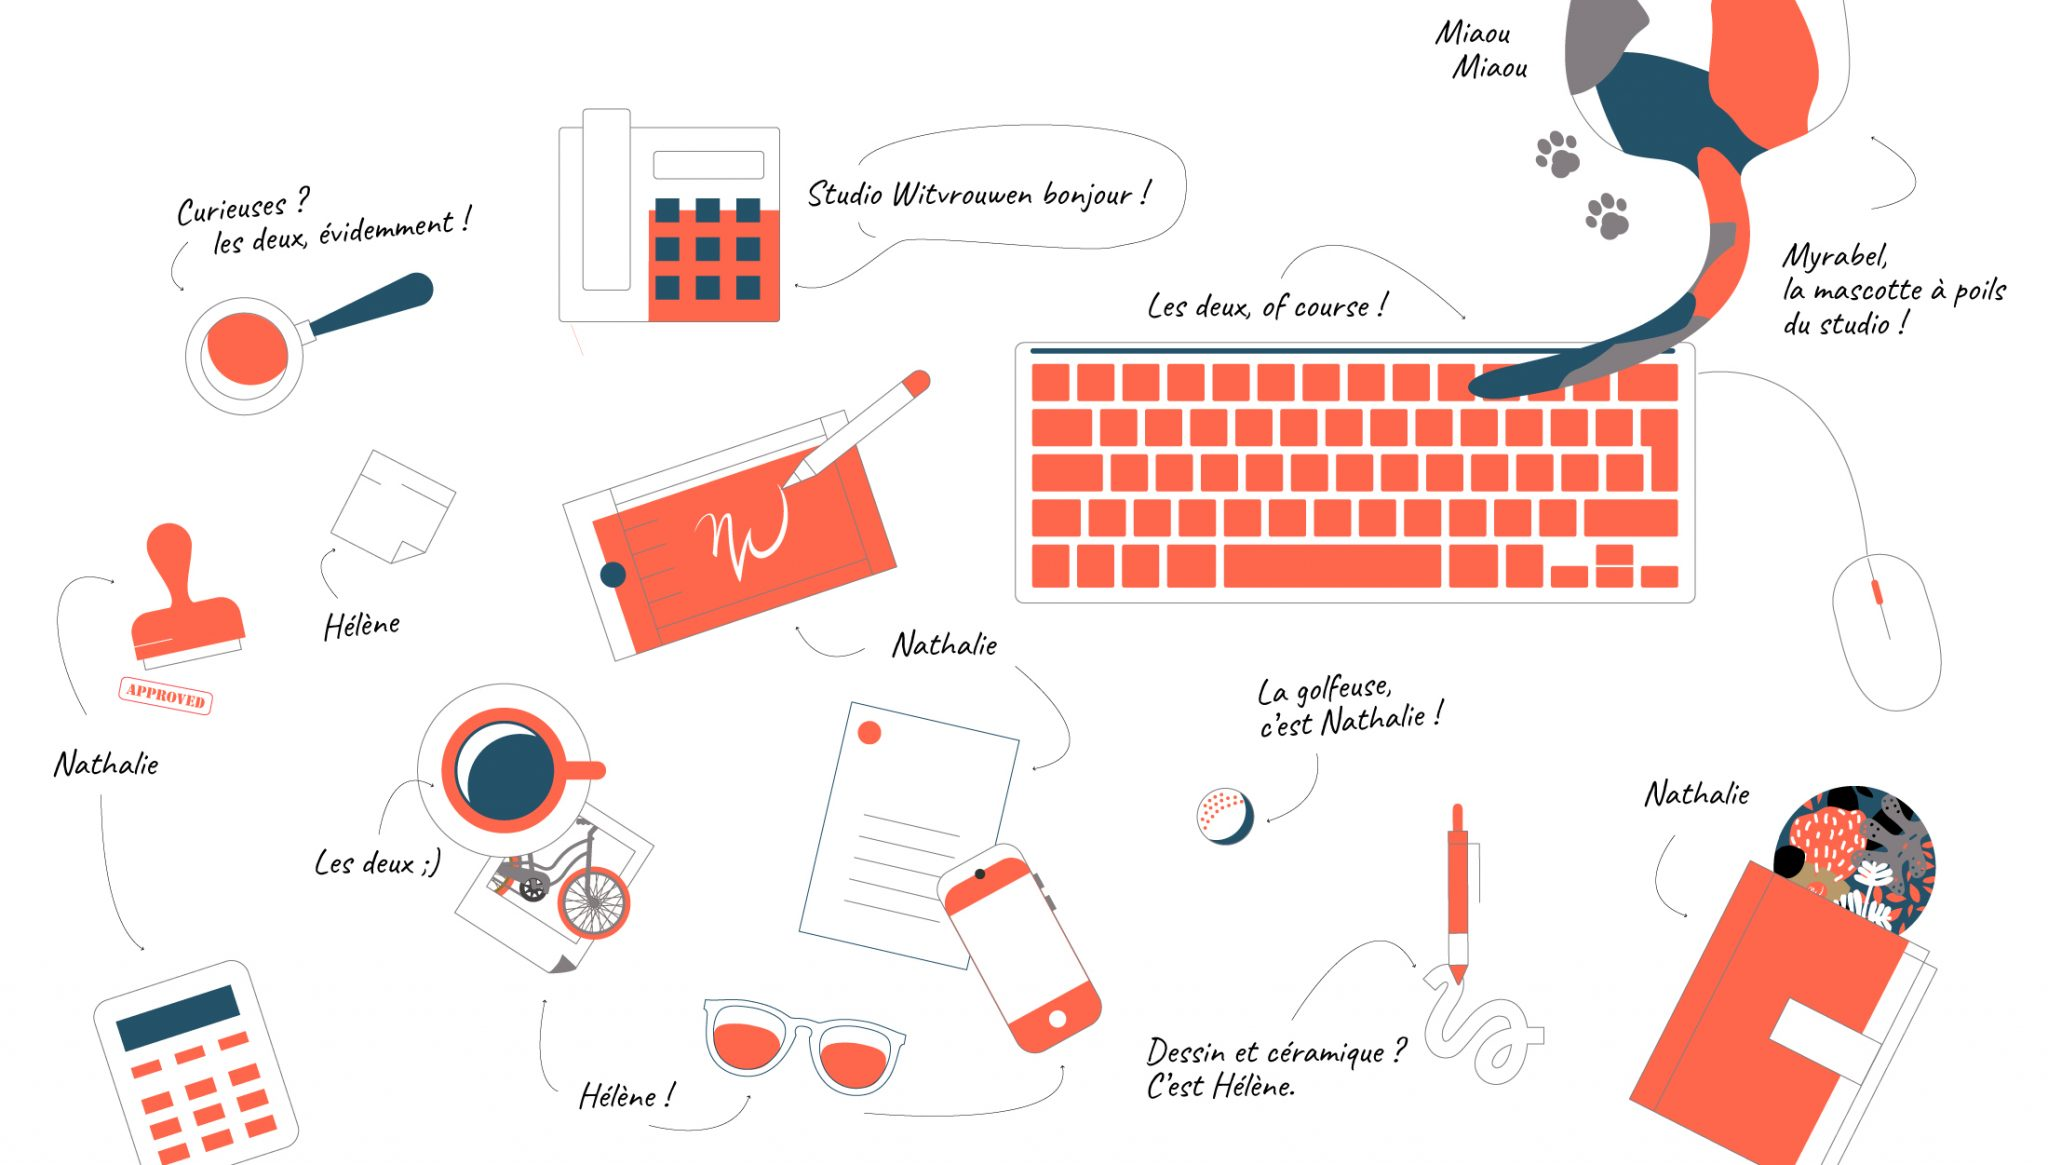 studio witvrouwenstudio witvrouwen illustration drawings dessin graphic design color identity